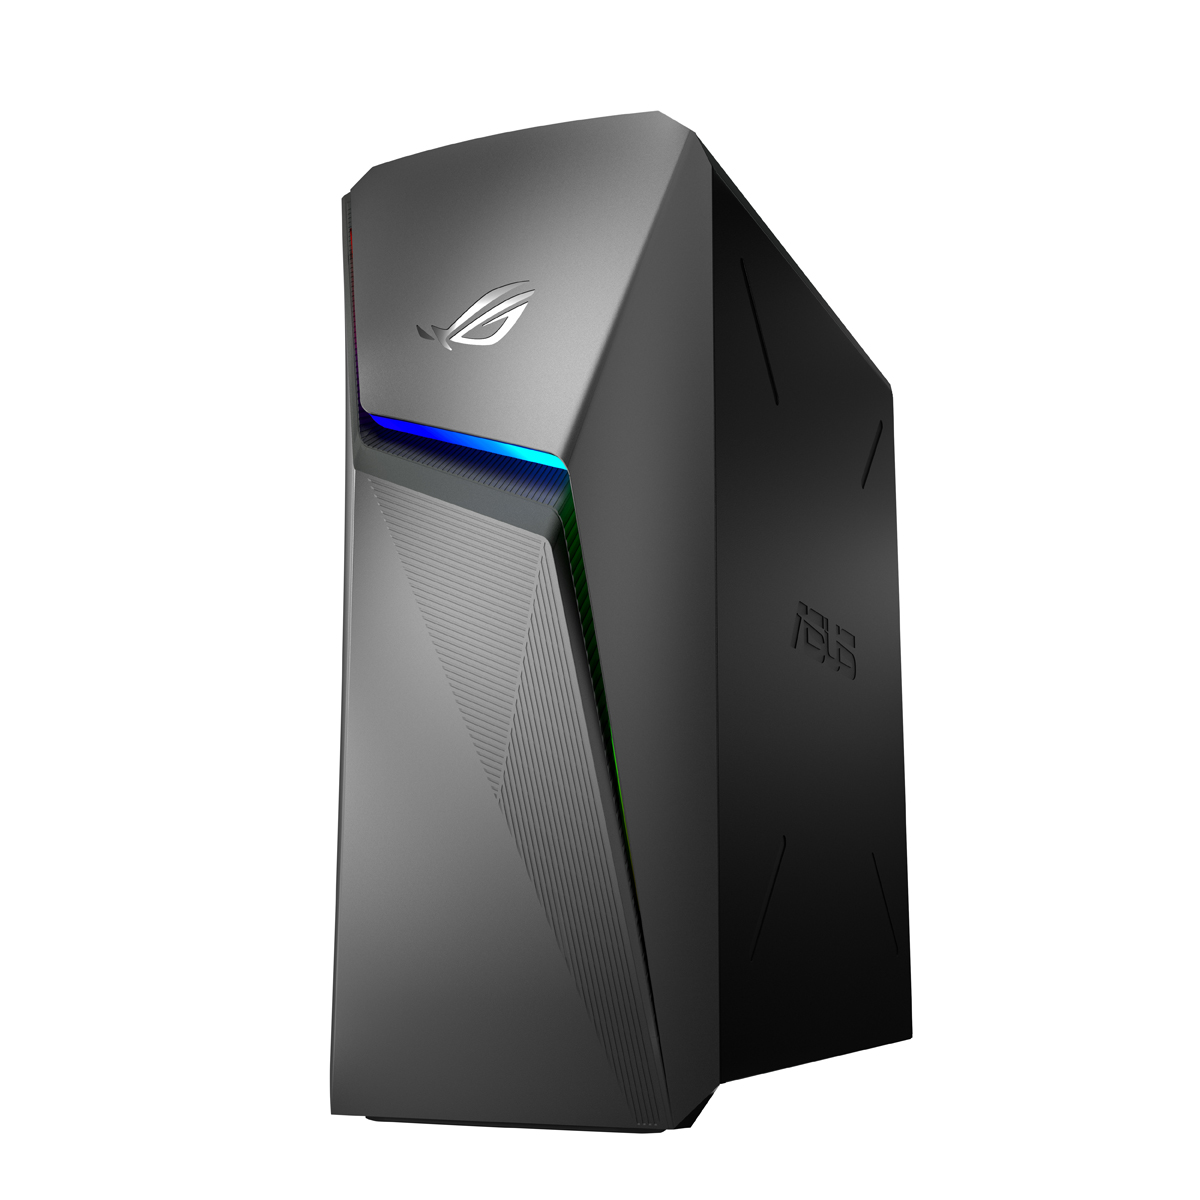 GL10DH-R7R2070 ASUS(エイスース) ゲーミングデスクトップパソコン ROG Strix GL10DH アイアングレー